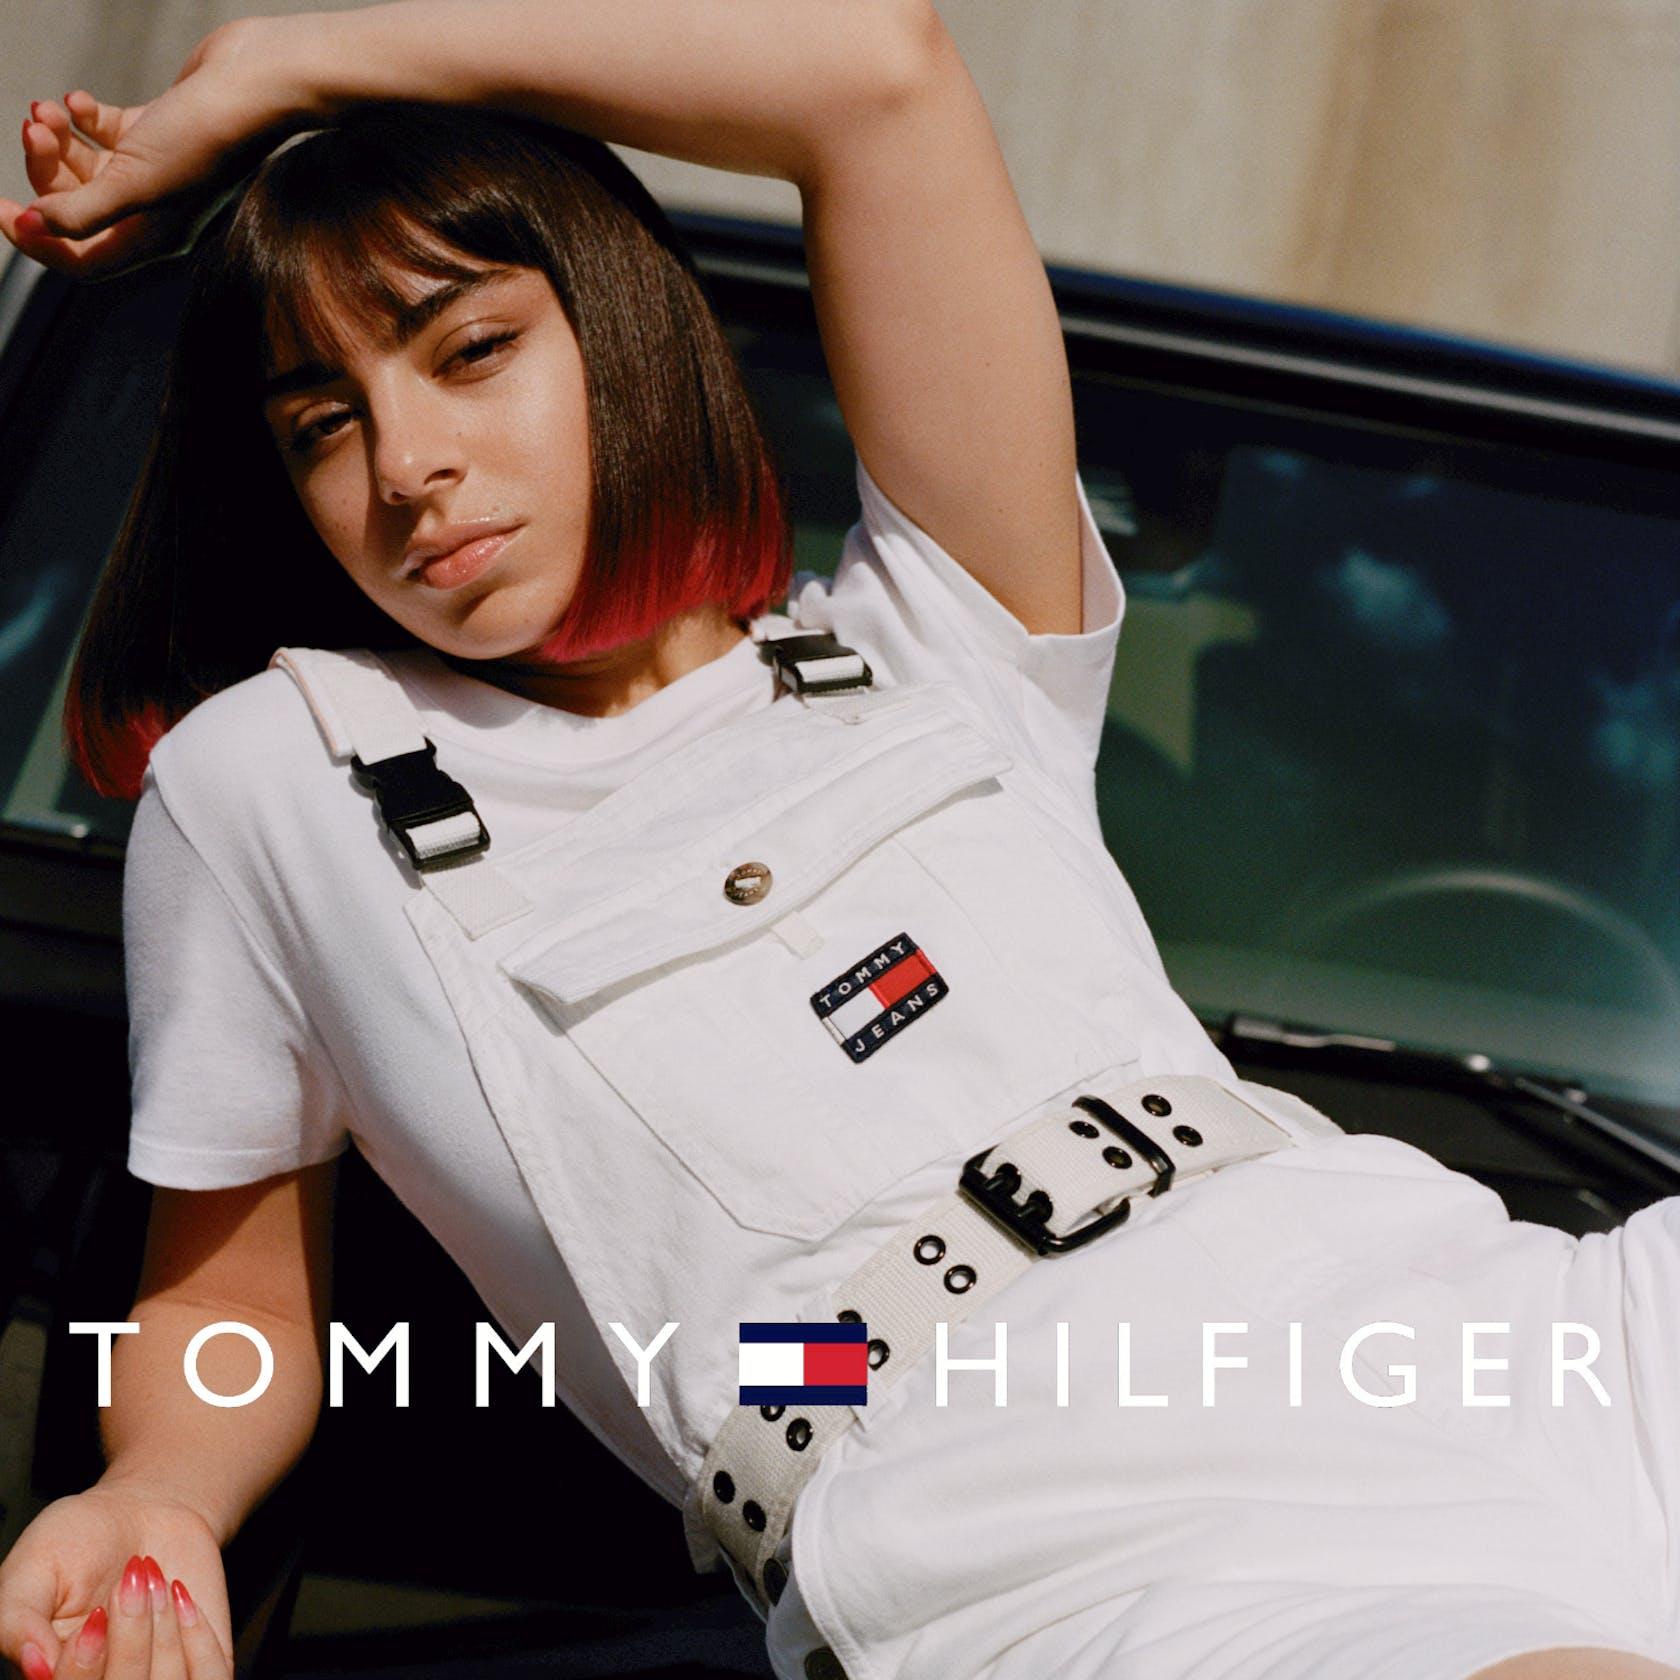 TOMMY HILFIGER  〉〉〉